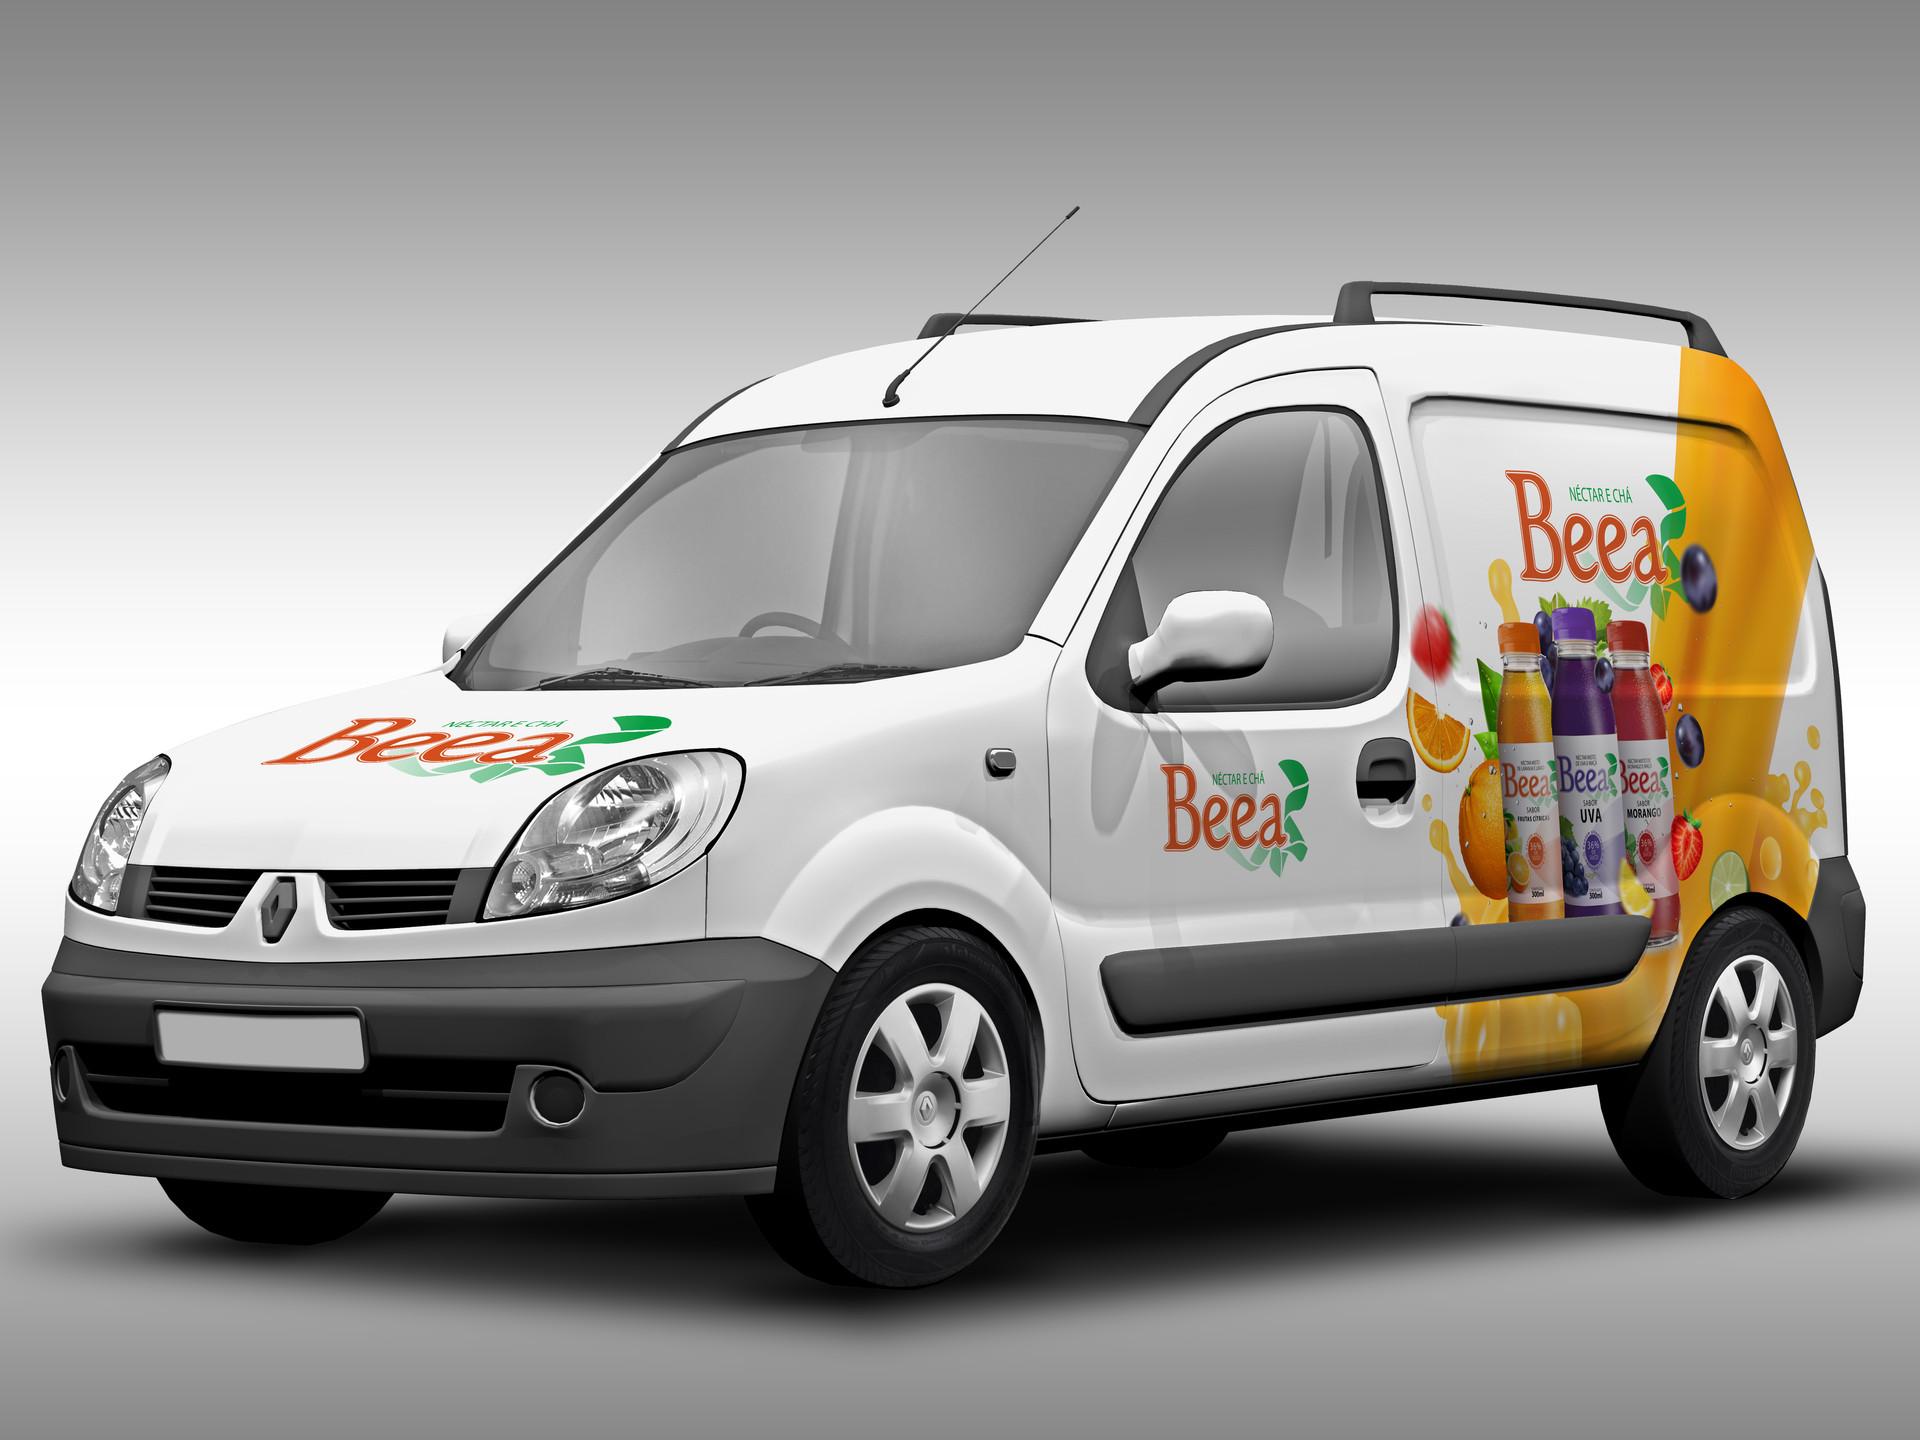 GemGfx_Vehicle_Branding_Mockup.jpg